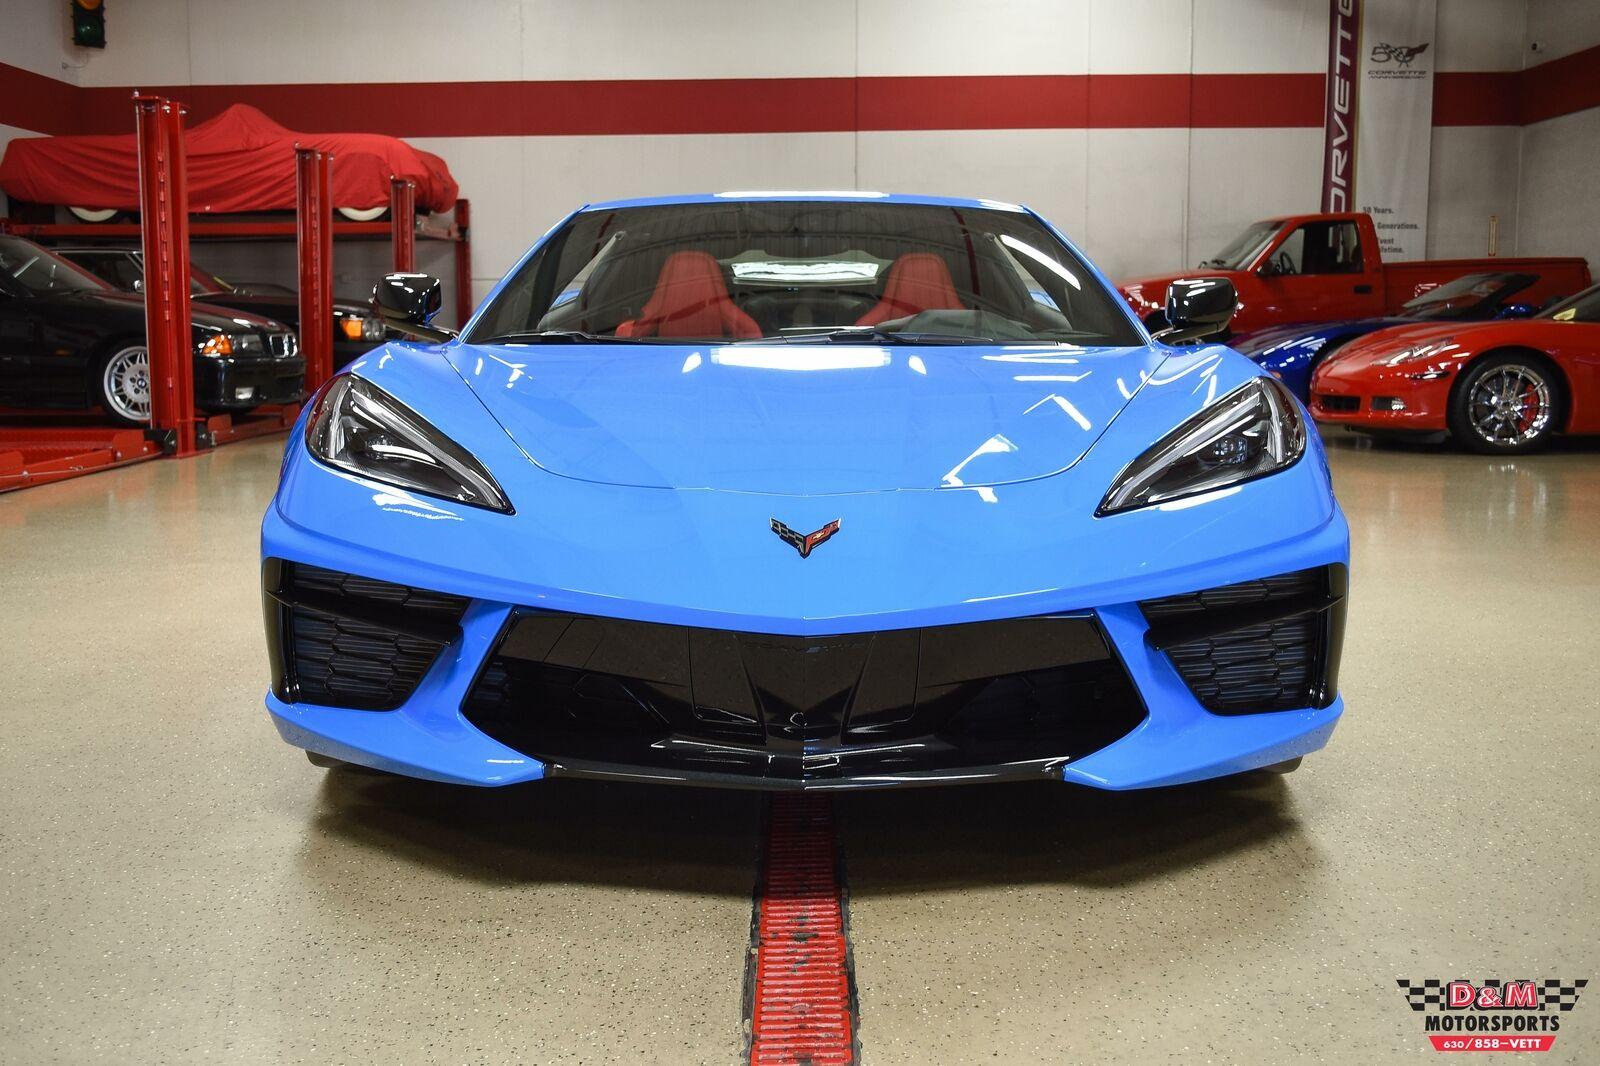 2020 Blue Chevrolet Corvette Stingray  | C7 Corvette Photo 9